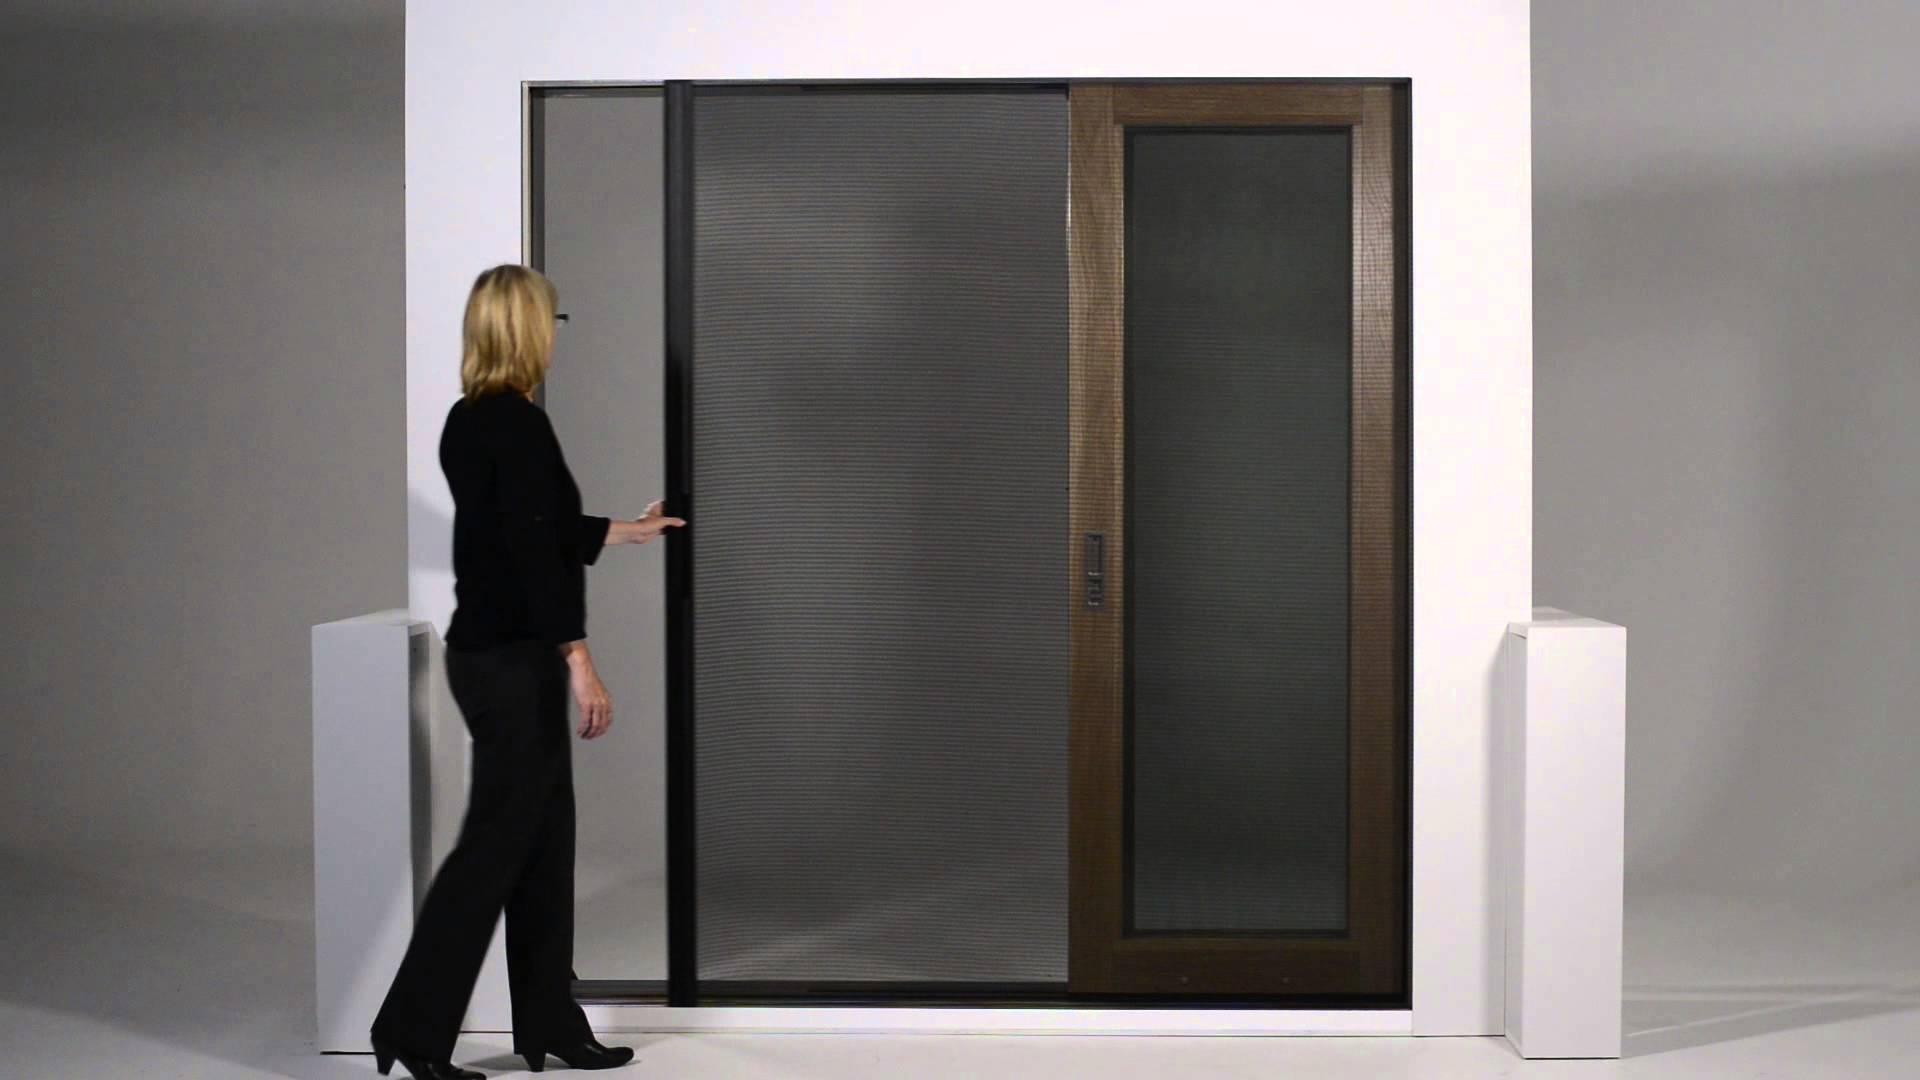 Marvin scenic doors ultimate sliding screen branford for Marvin scenic doors